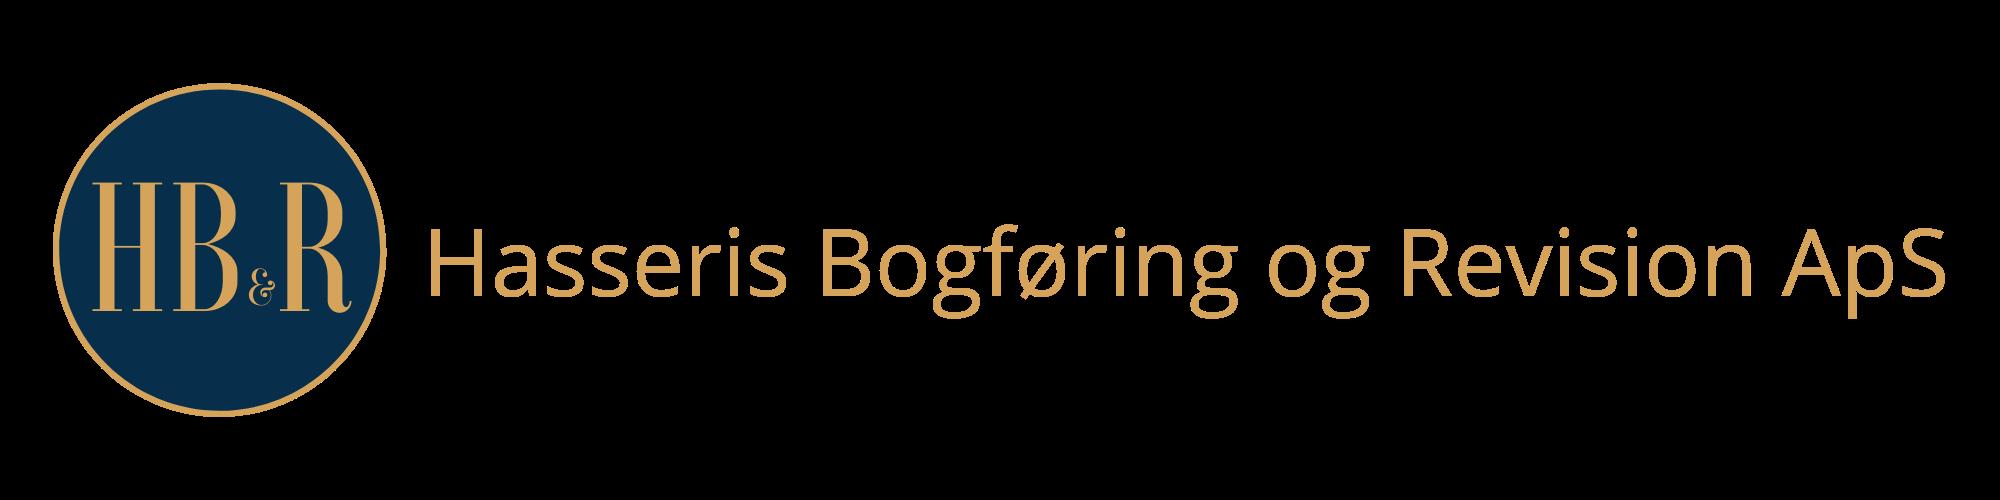 hasserisbogføring.dk